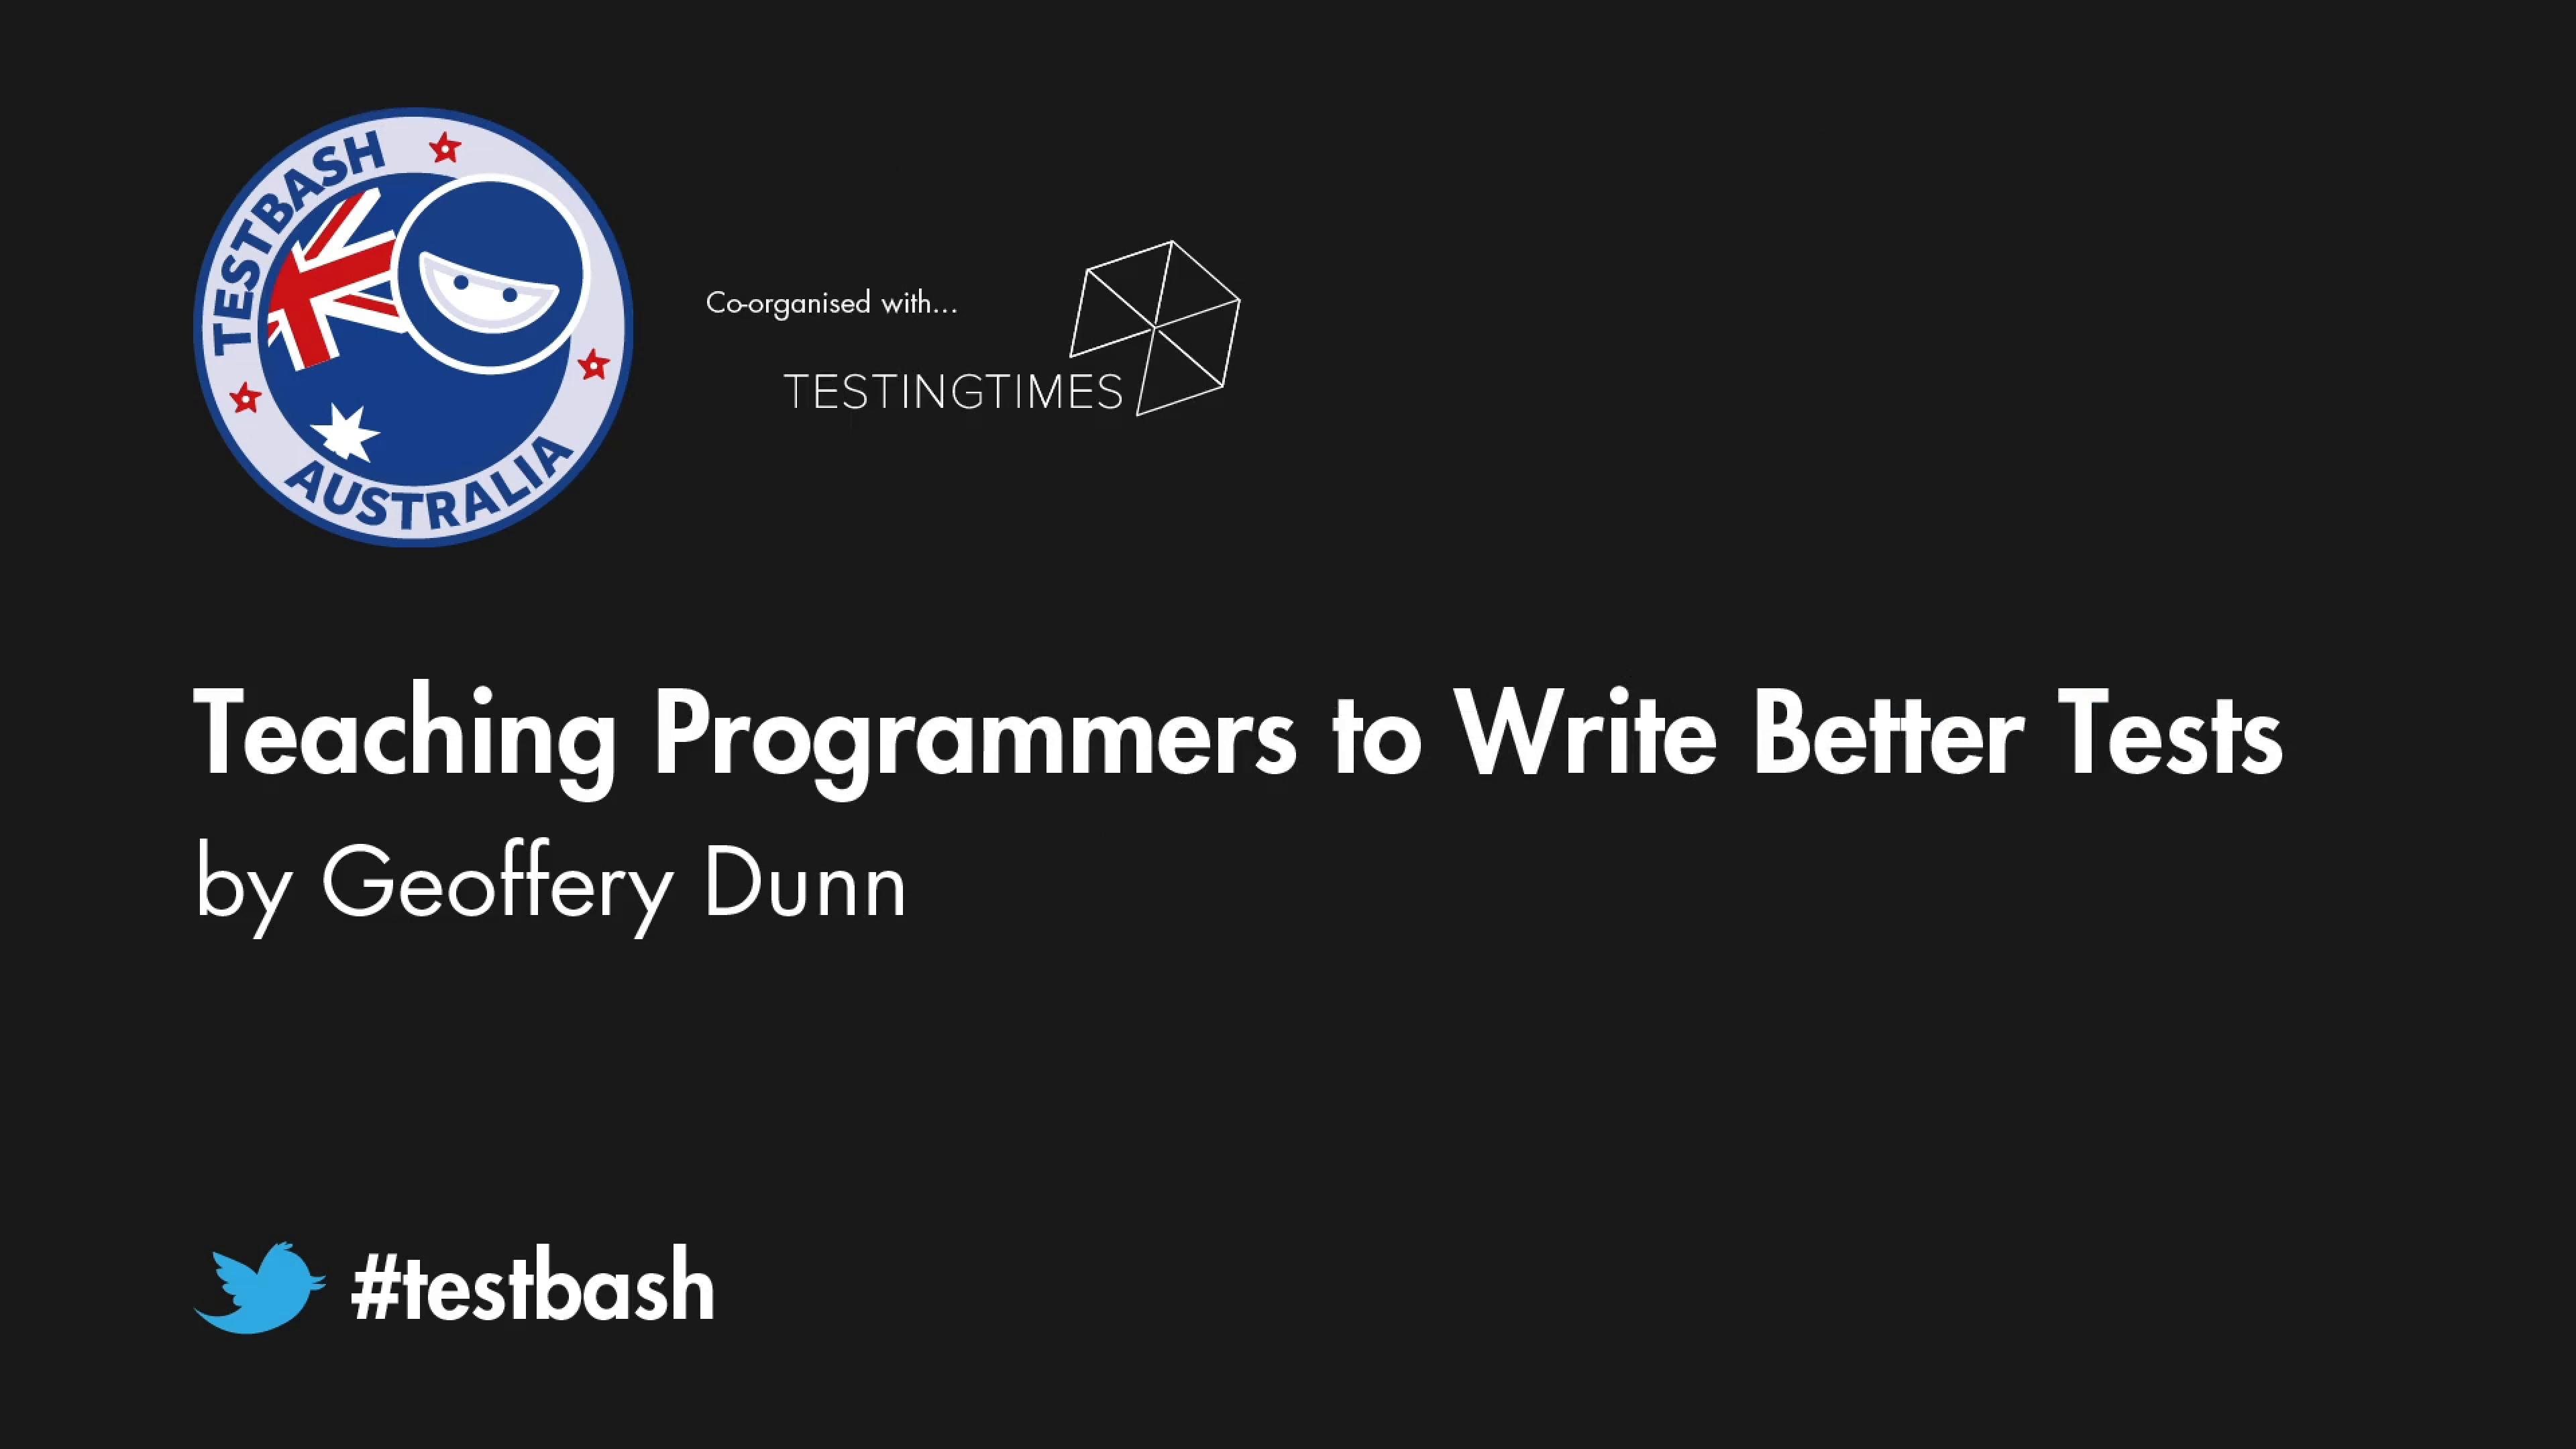 Teaching Programmers to Write Better Tests - Geoffrey Dunn